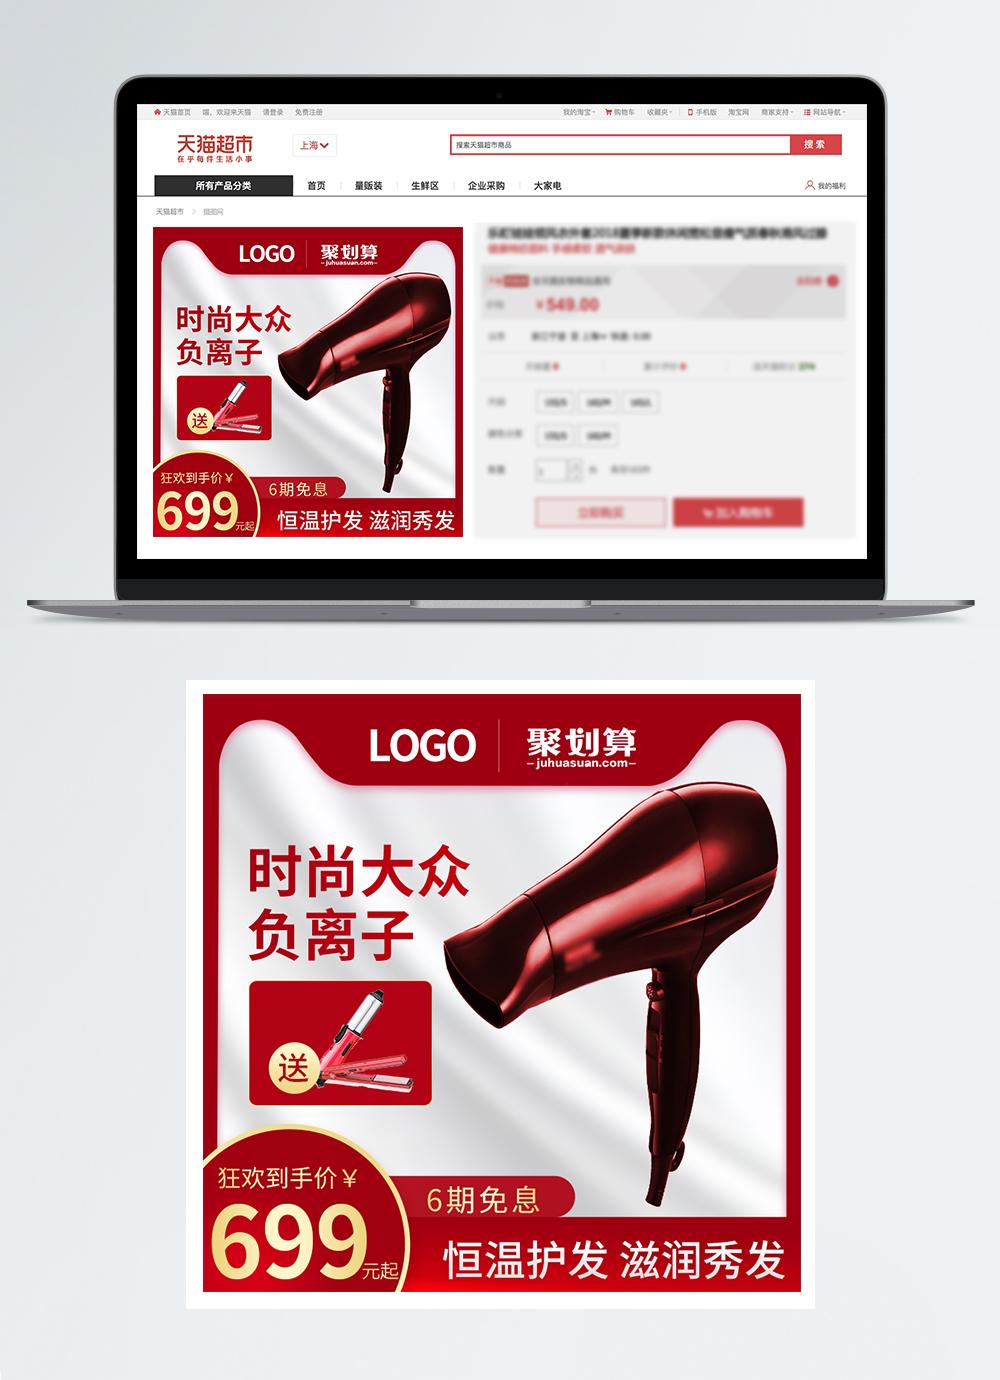 secador de pelo taobao e commerce mapa principal Imagen